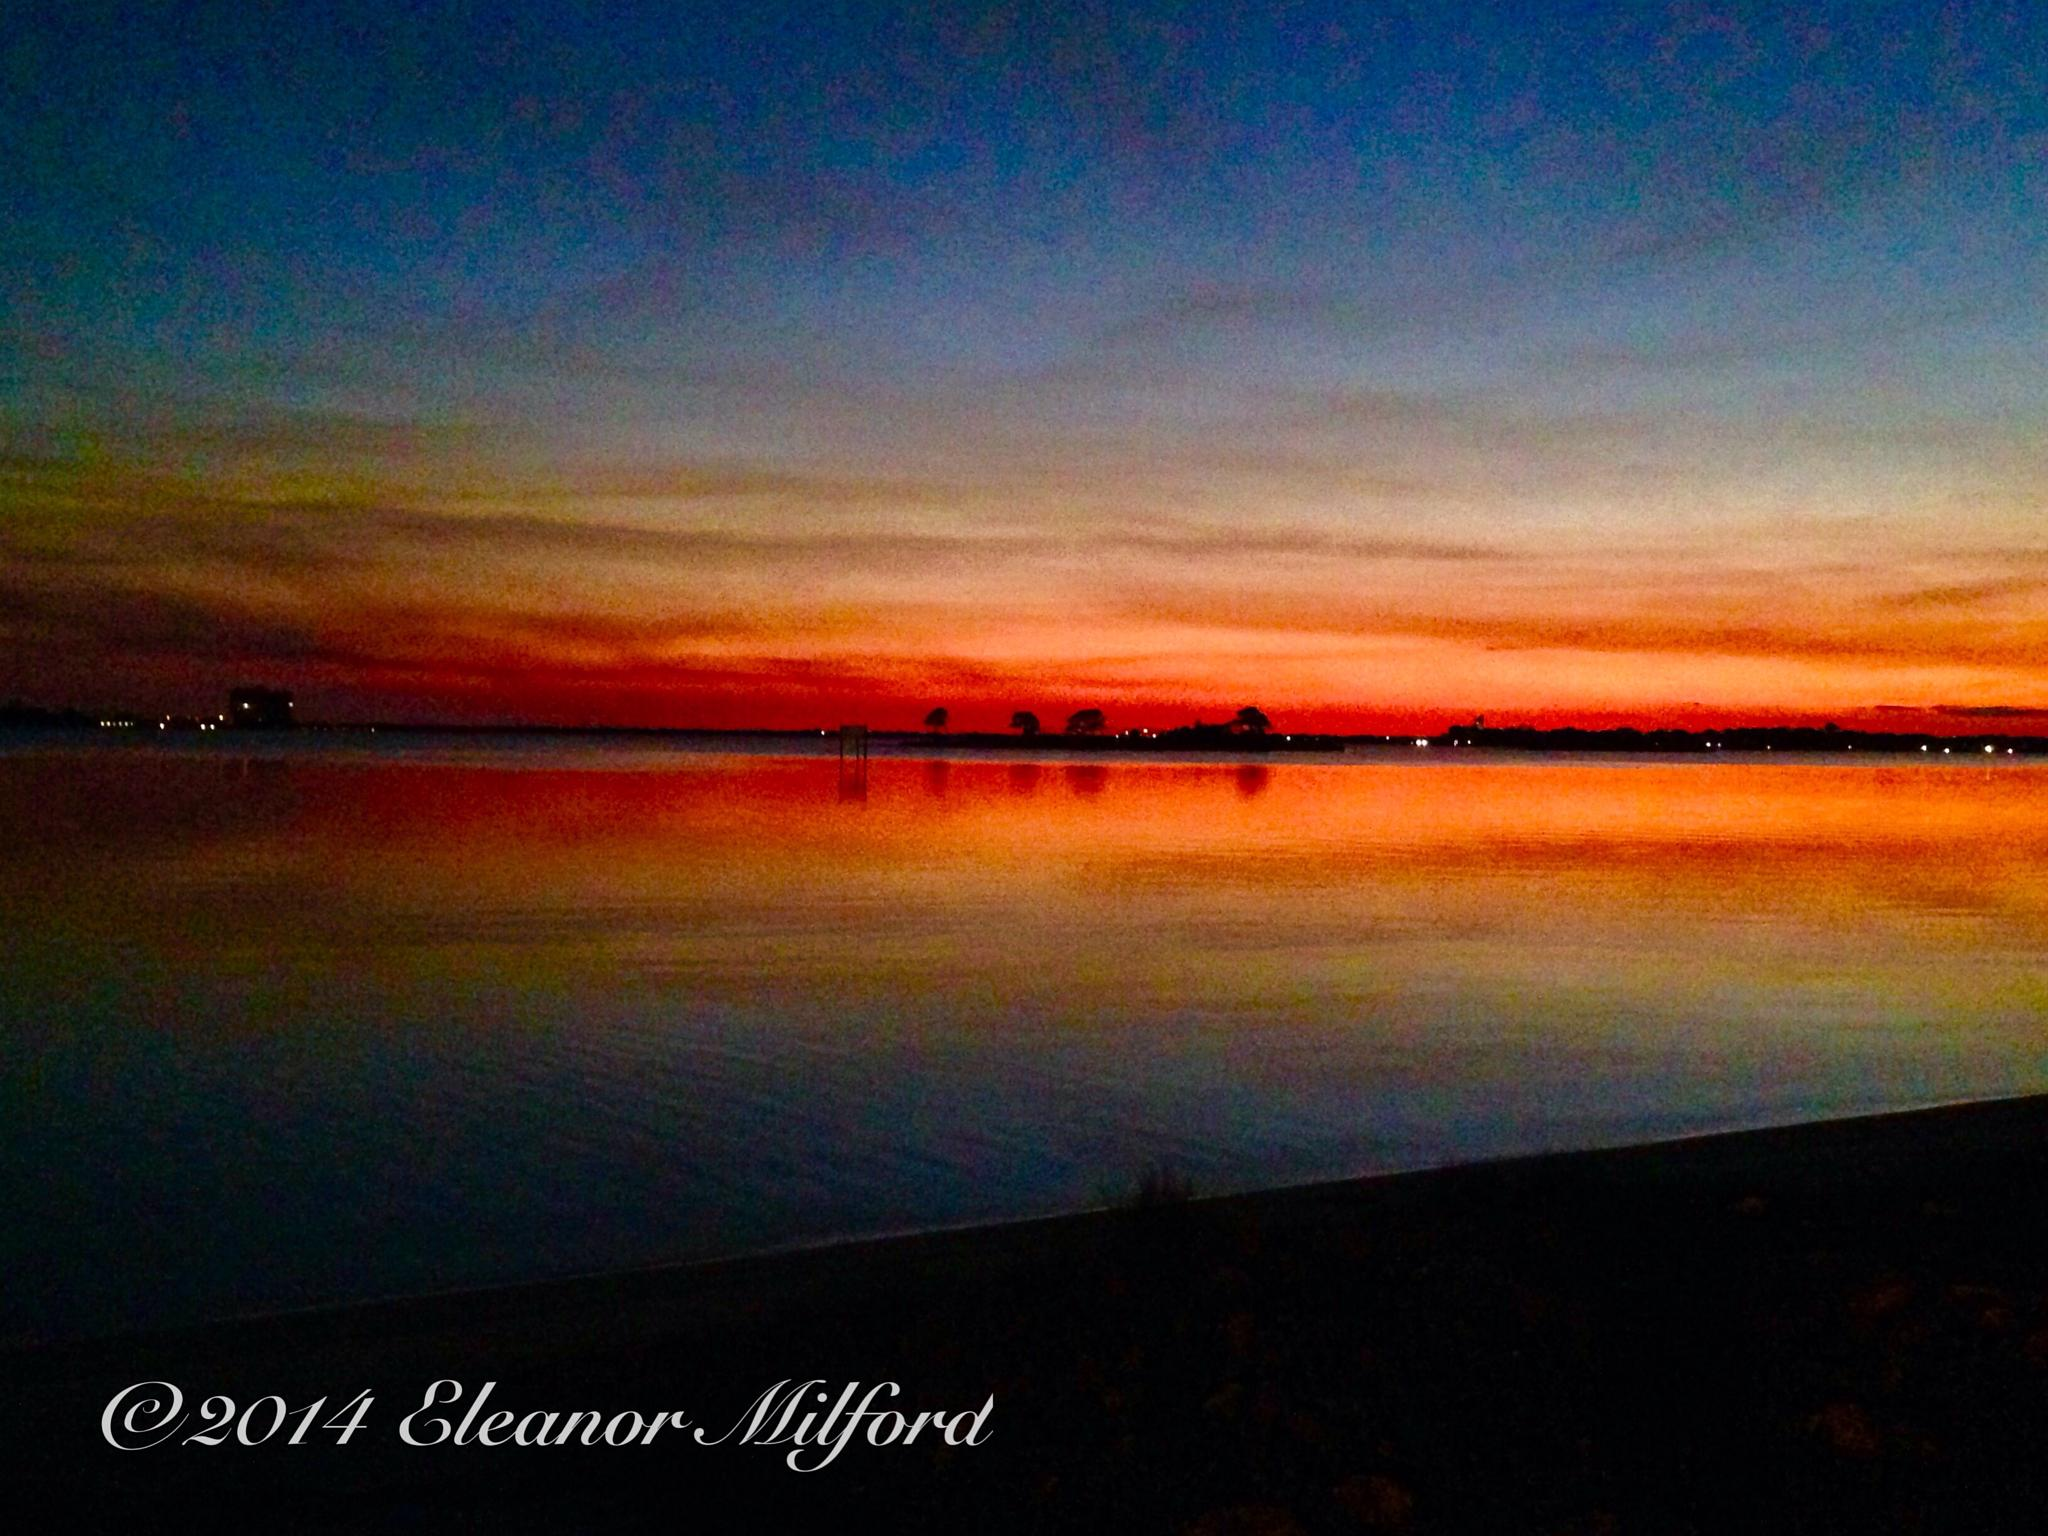 Sunset in Paradise  by PKangel